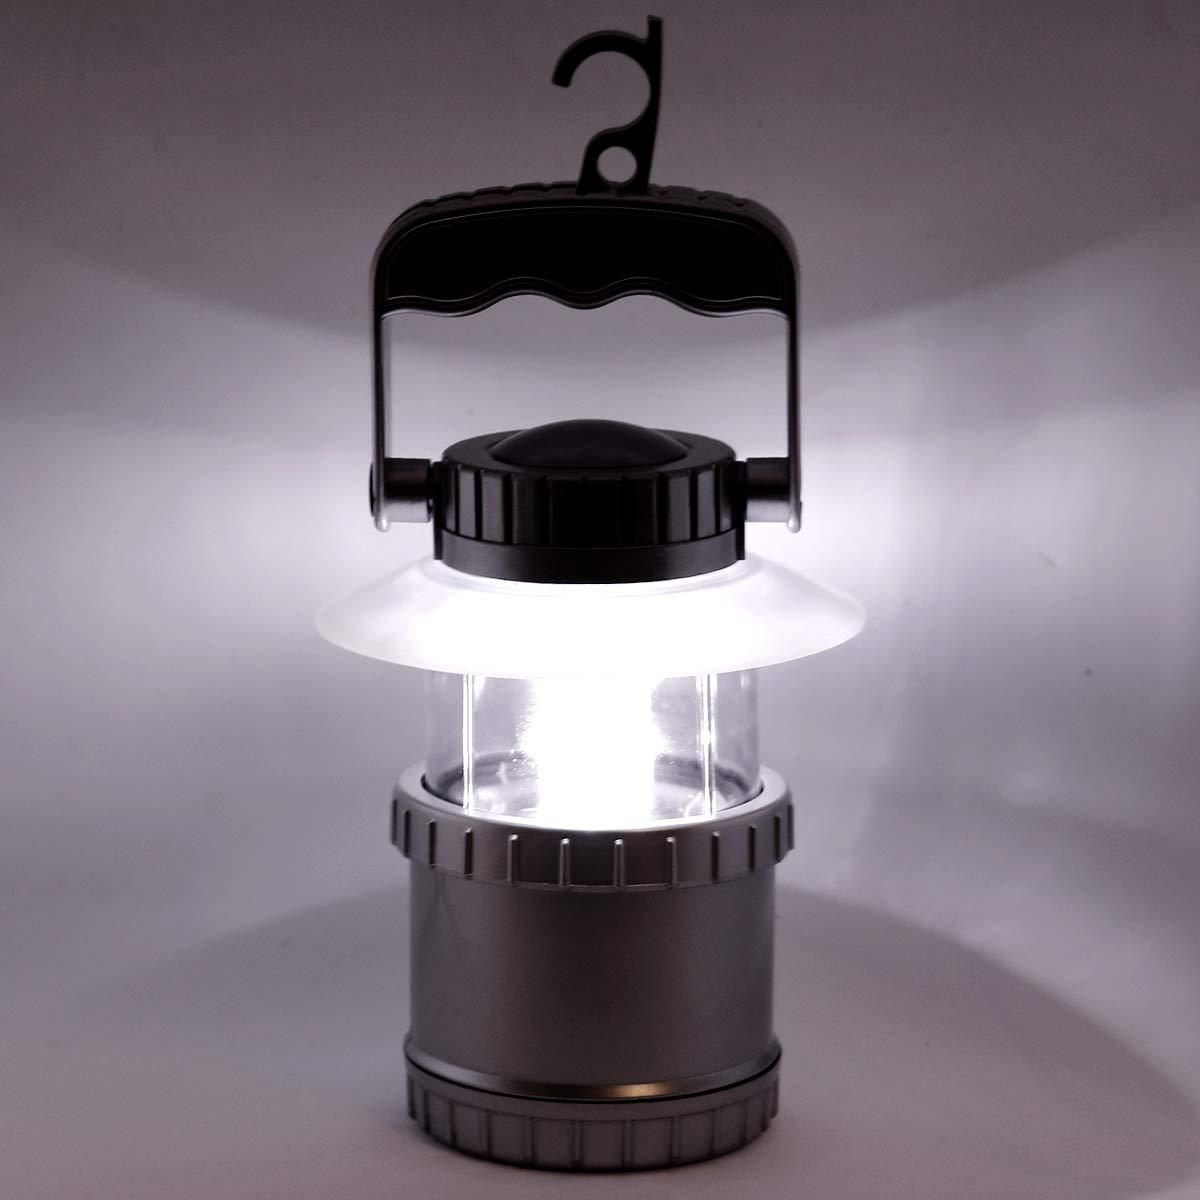 TRONJE LED Campinglampe Zeltlampe /Ø13x26cm Notfall-Lampe Gartenleuchte Sturm-Laterne Silber